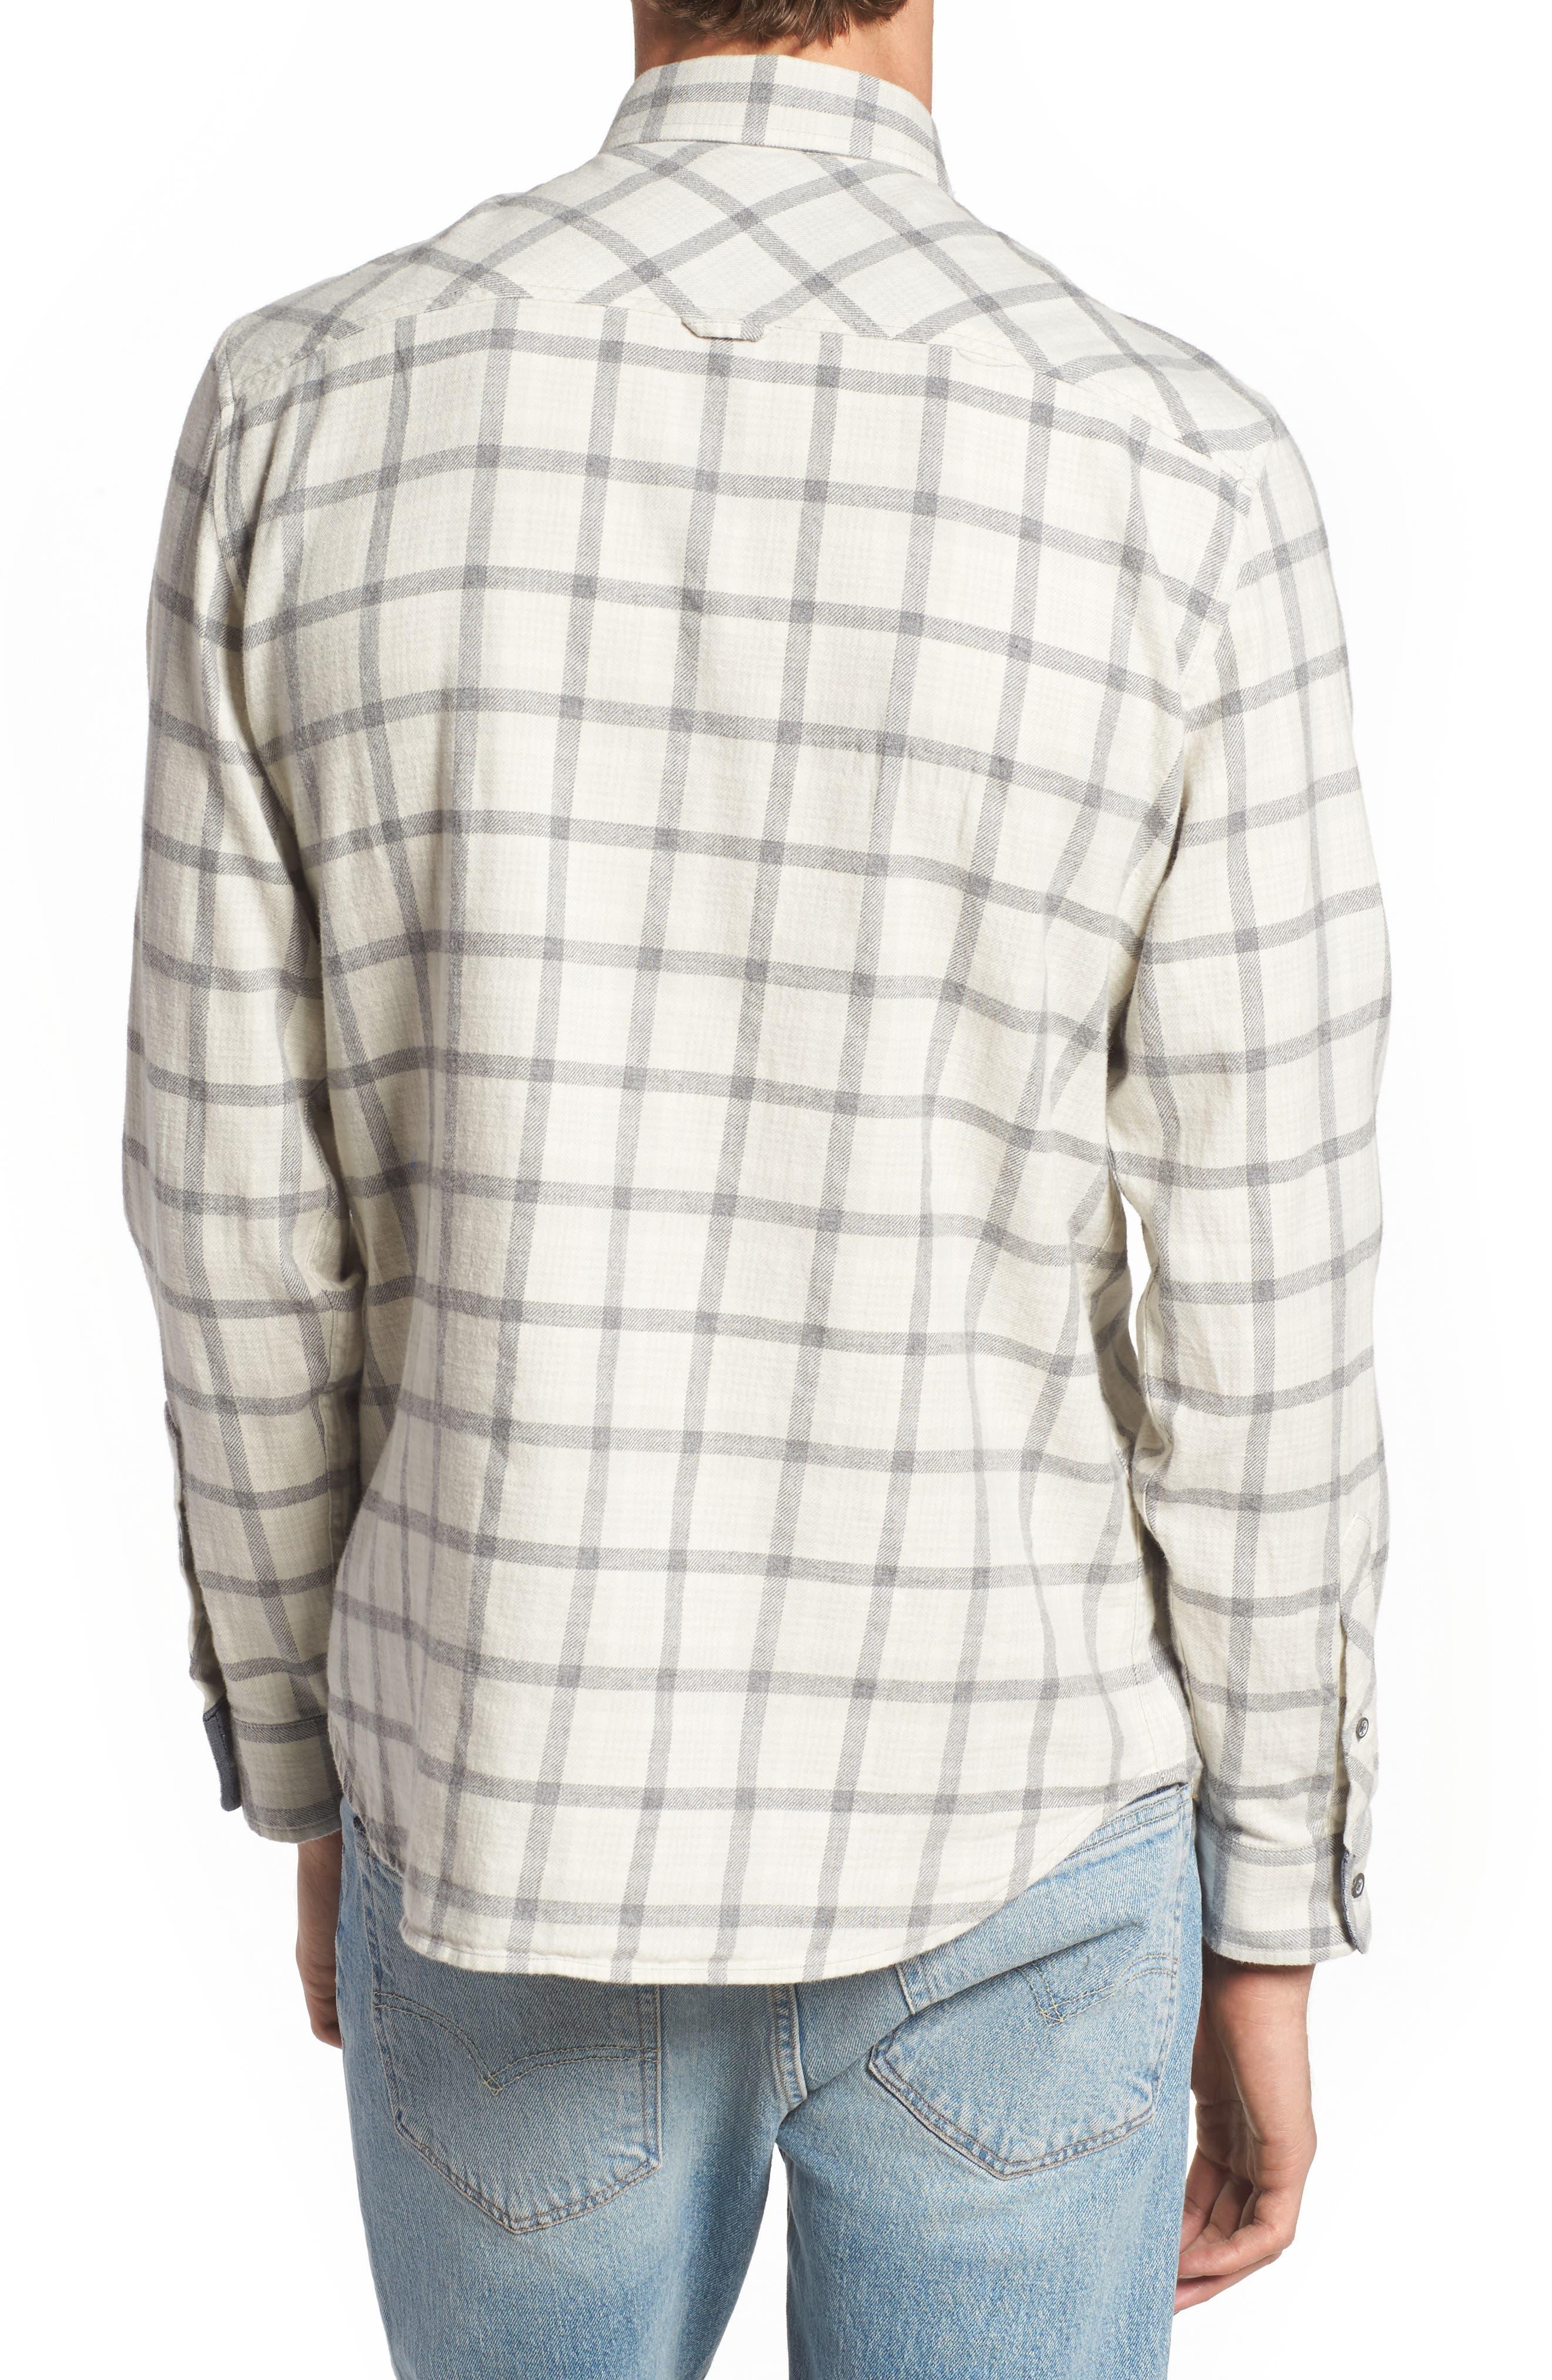 Grady Slim Fit Plaid Sport Shirt,                             Alternate thumbnail 2, color,                             Moon Glade/ Heather Grey